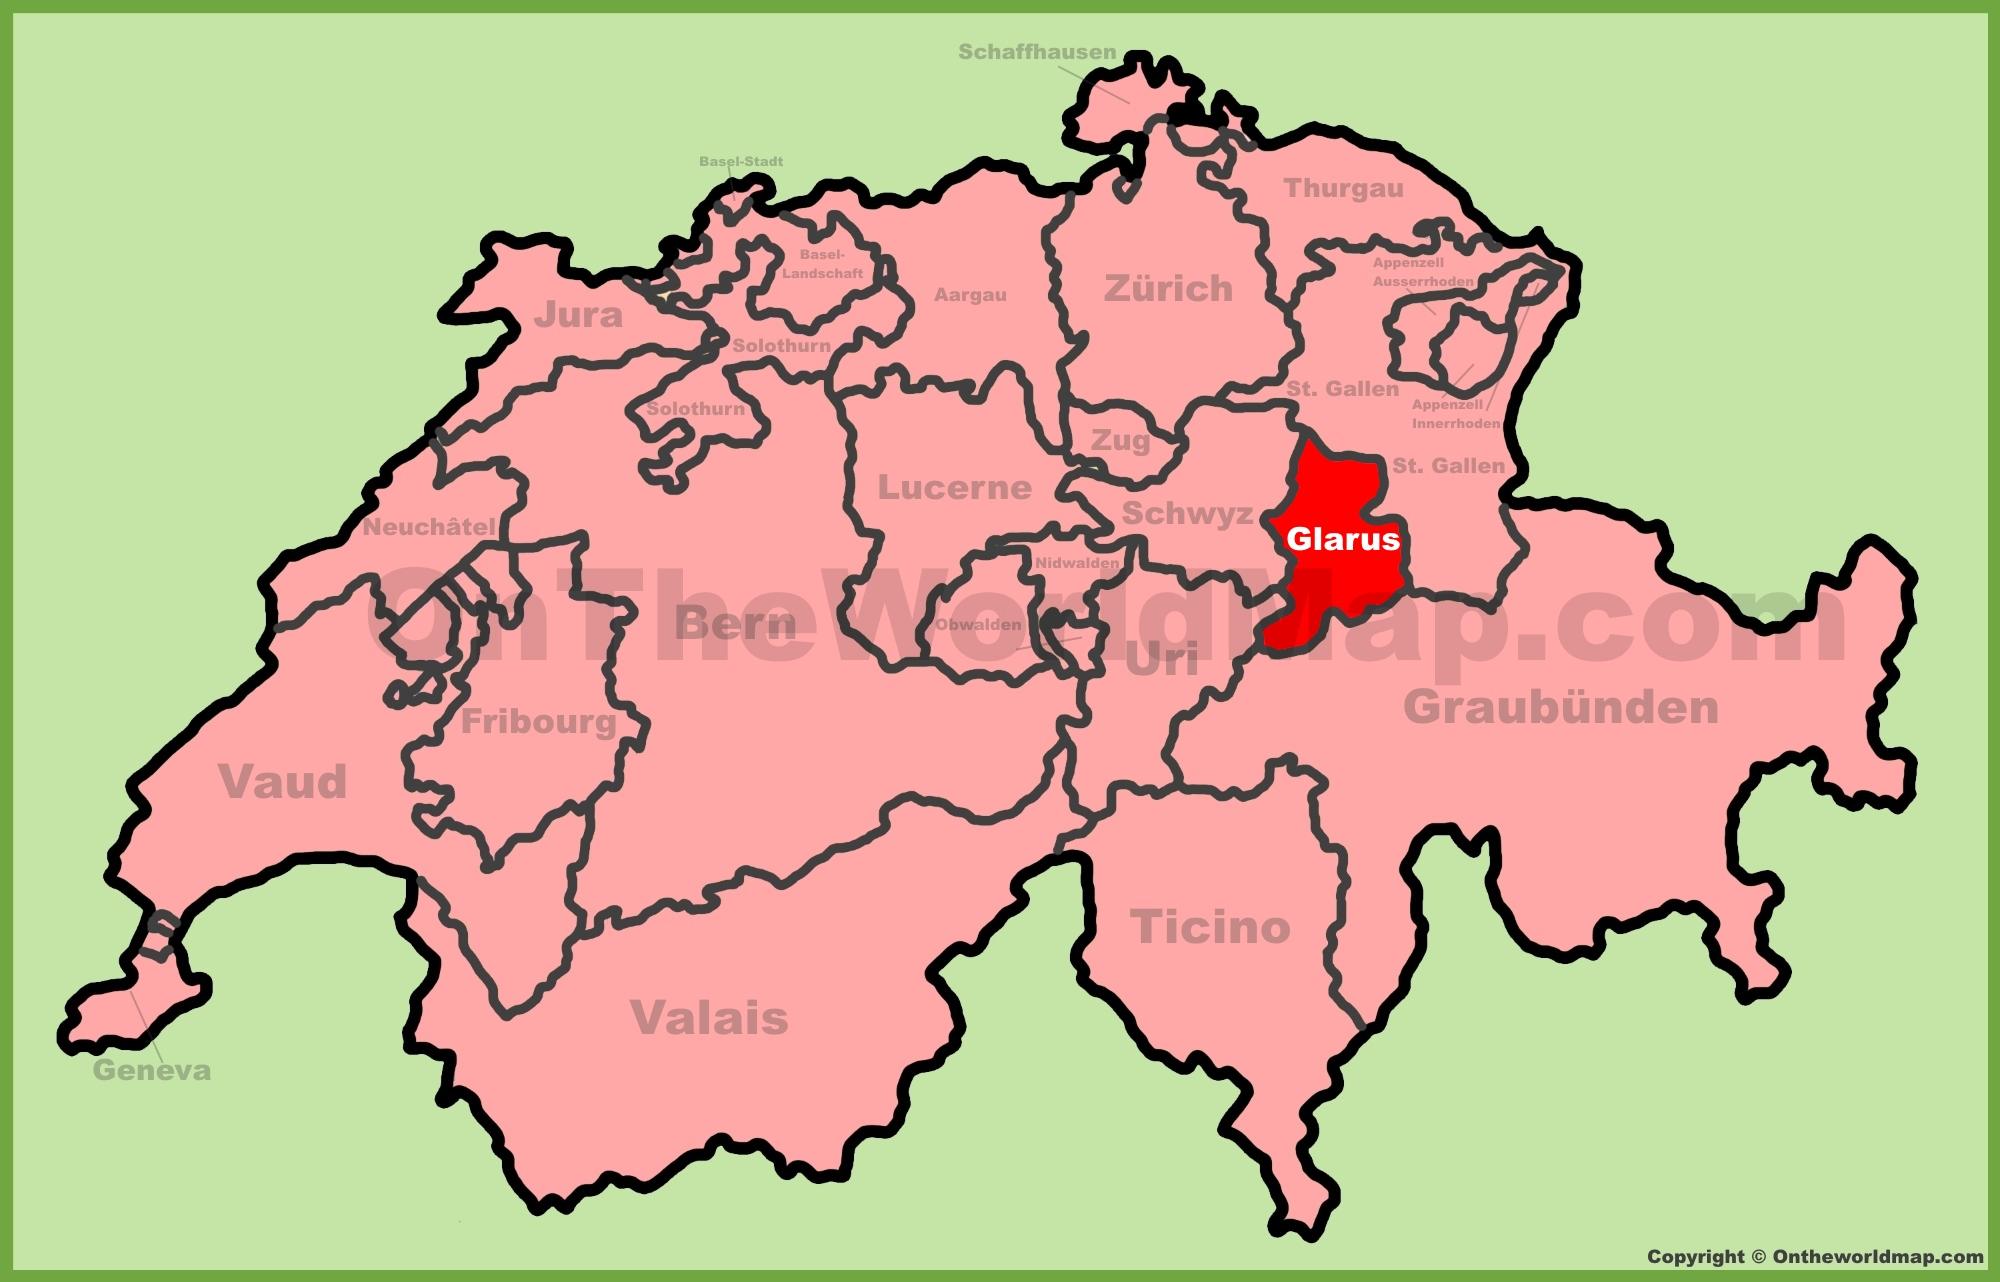 Canton of Glarus location on the Switzerland map